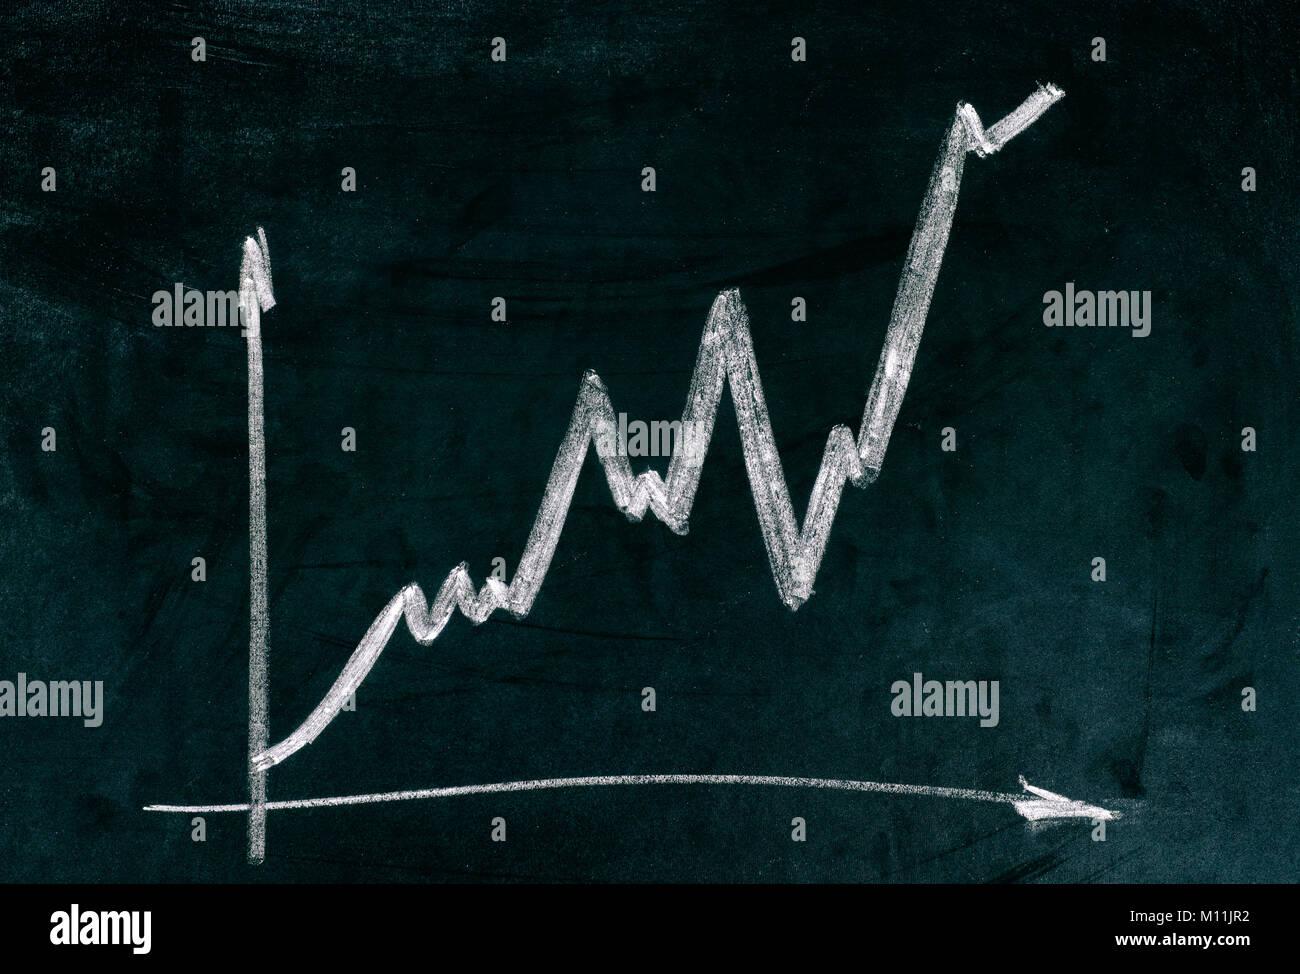 Chalk drawing graph on dark green chalk board. - Stock Image